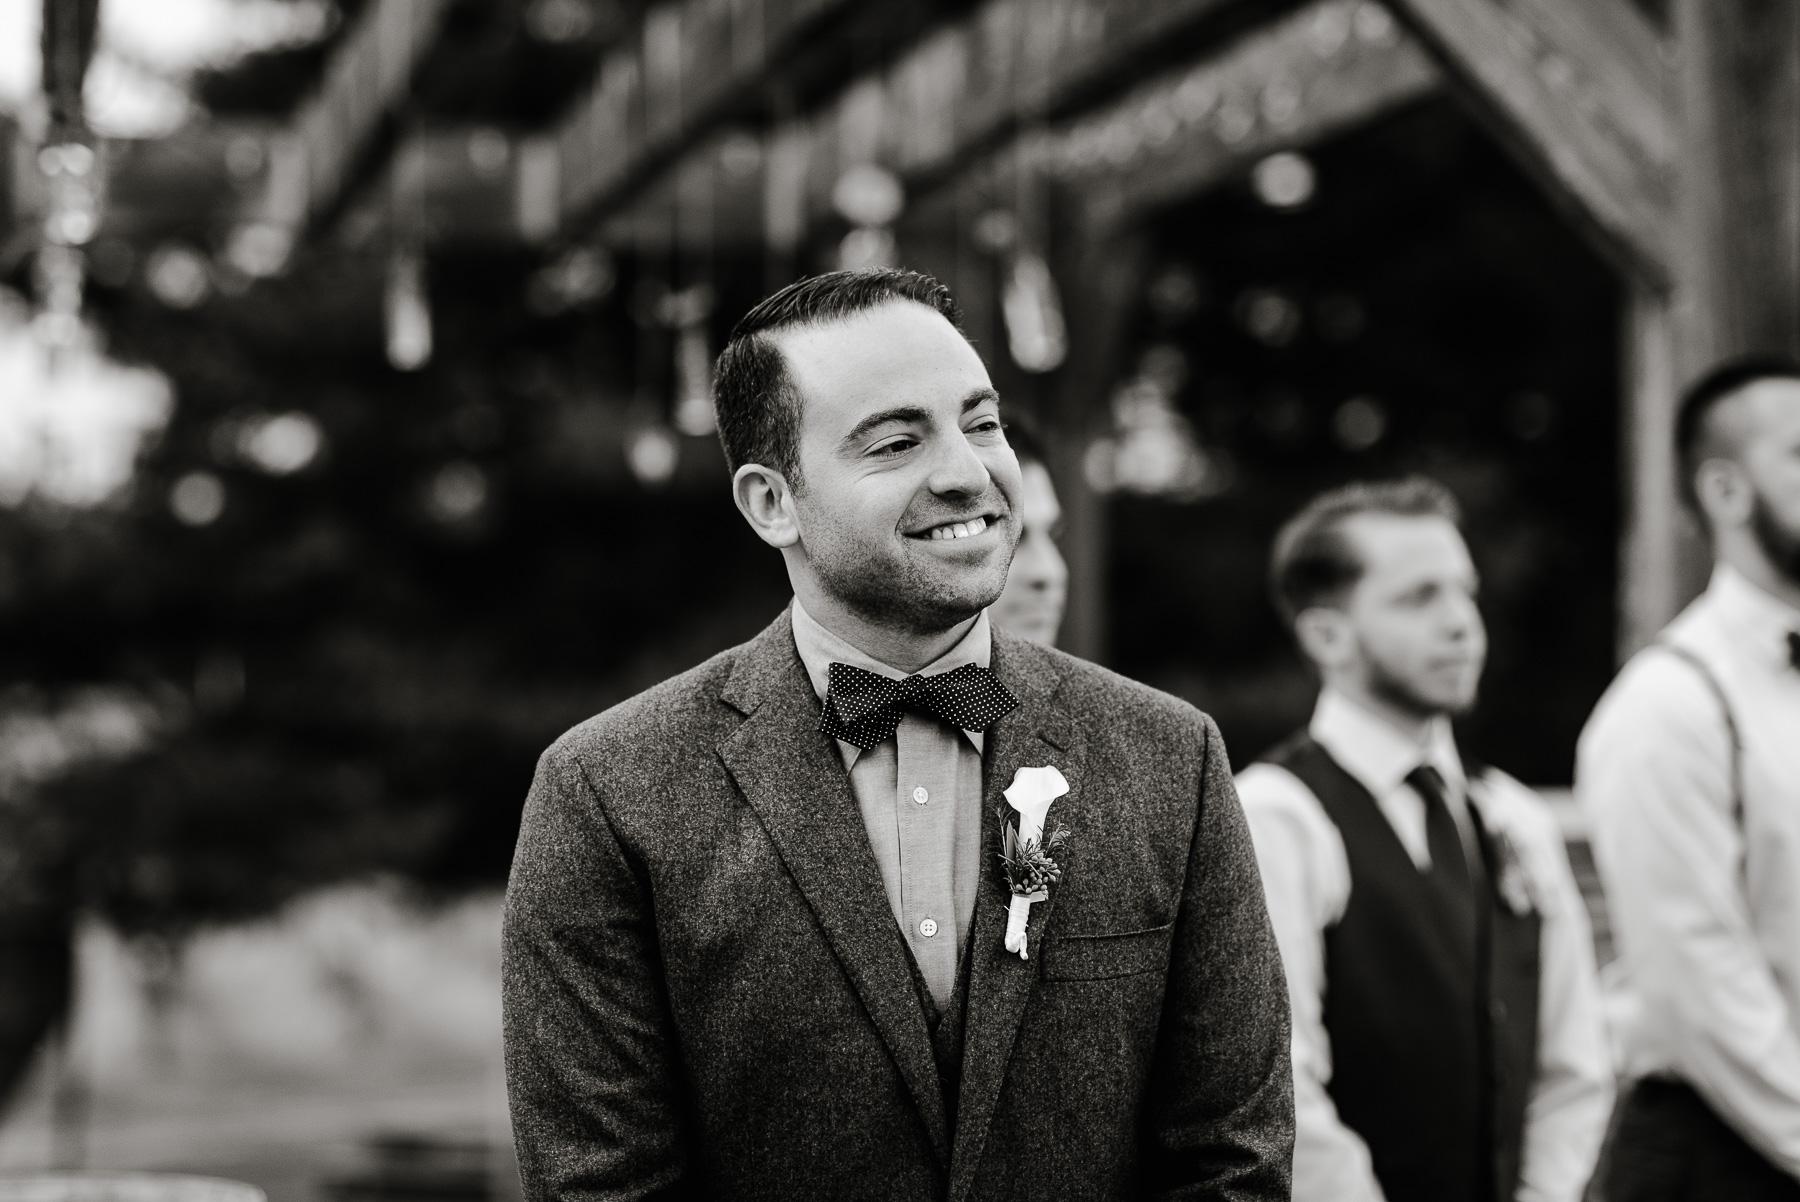 76-Laurita Winery Wedding New Jersey Wedding Photographer Laurita Winery Weddings Longbrook Photography.jpg